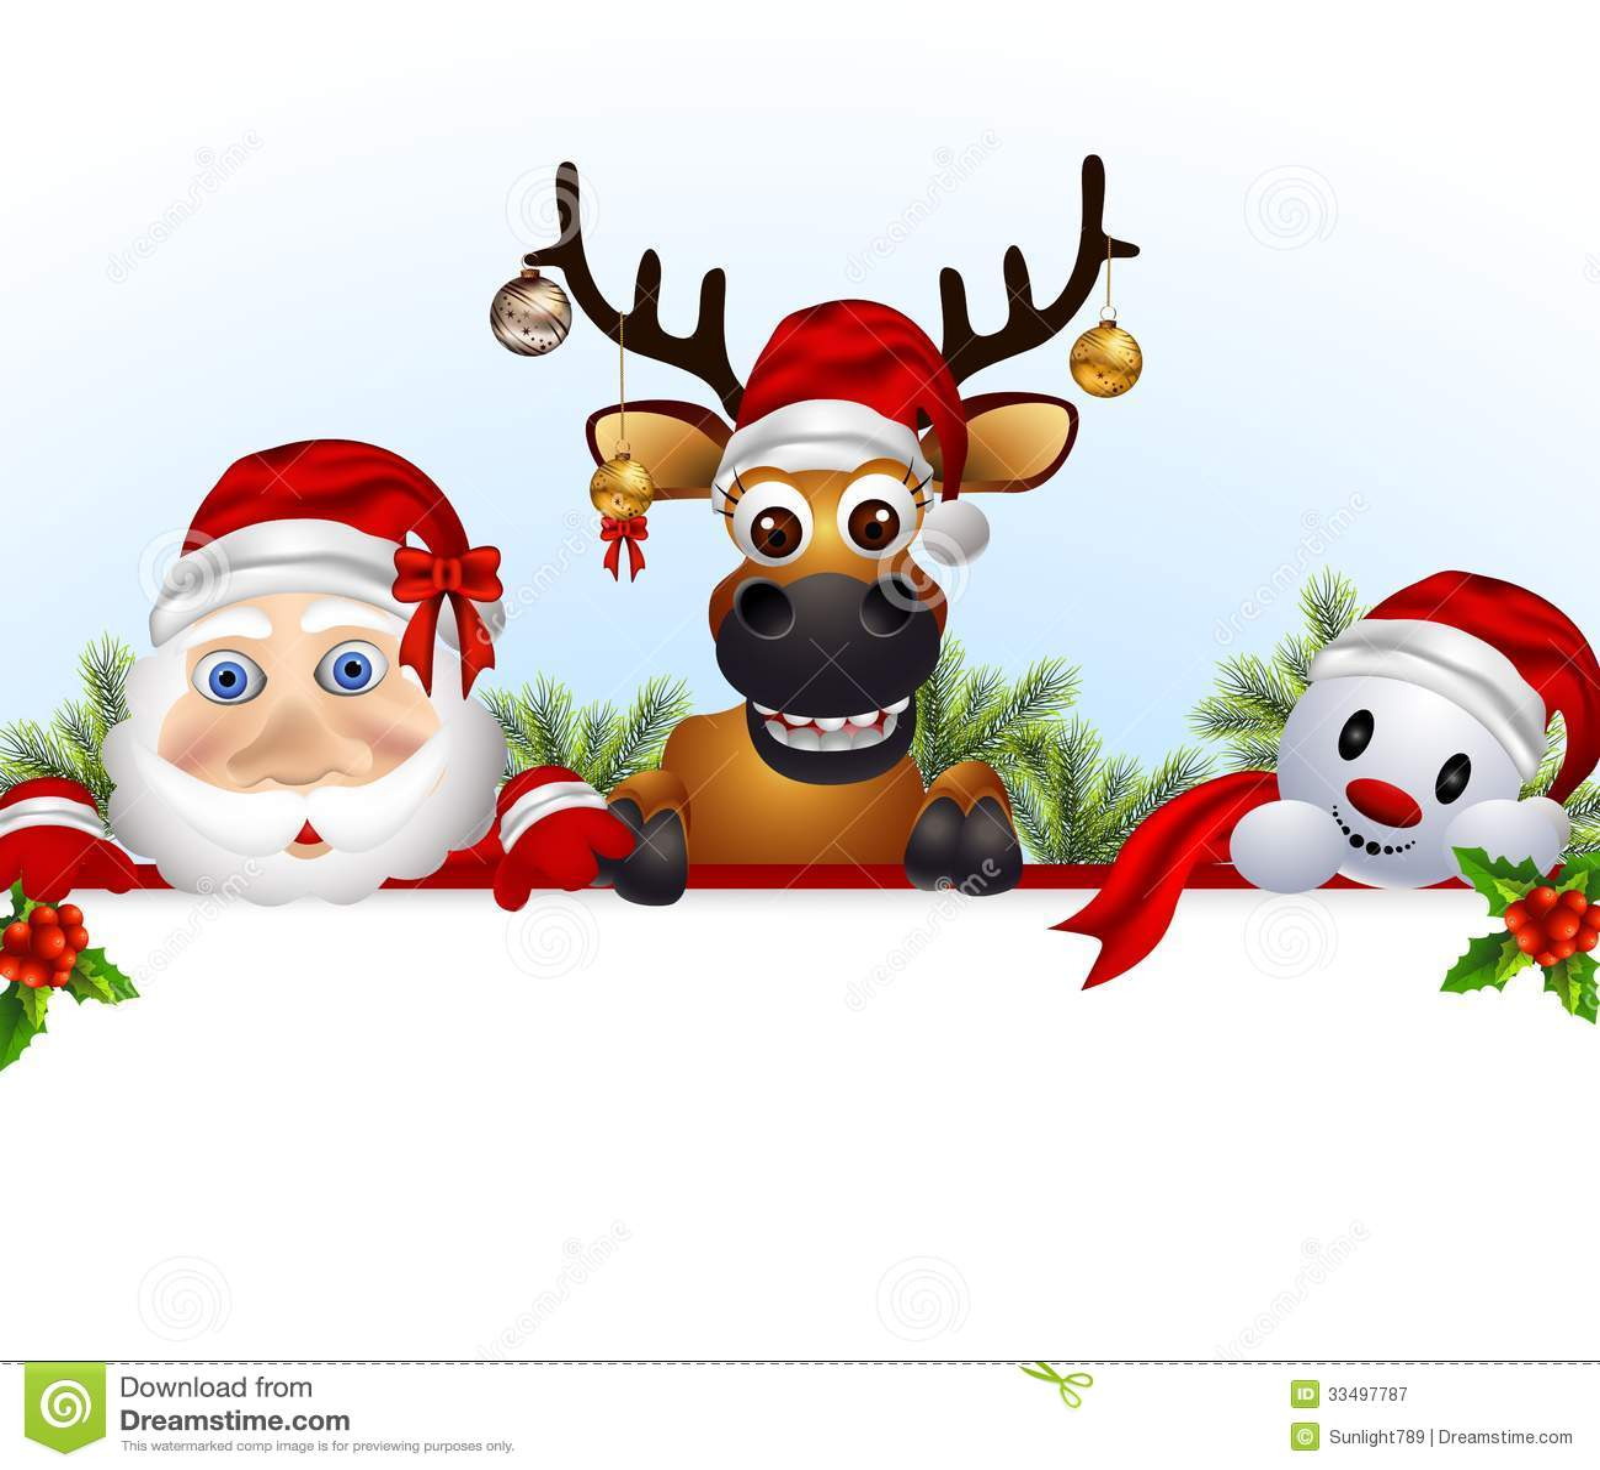 santa clausdeerand snowman cartoon with blank sign - Santa Snowman